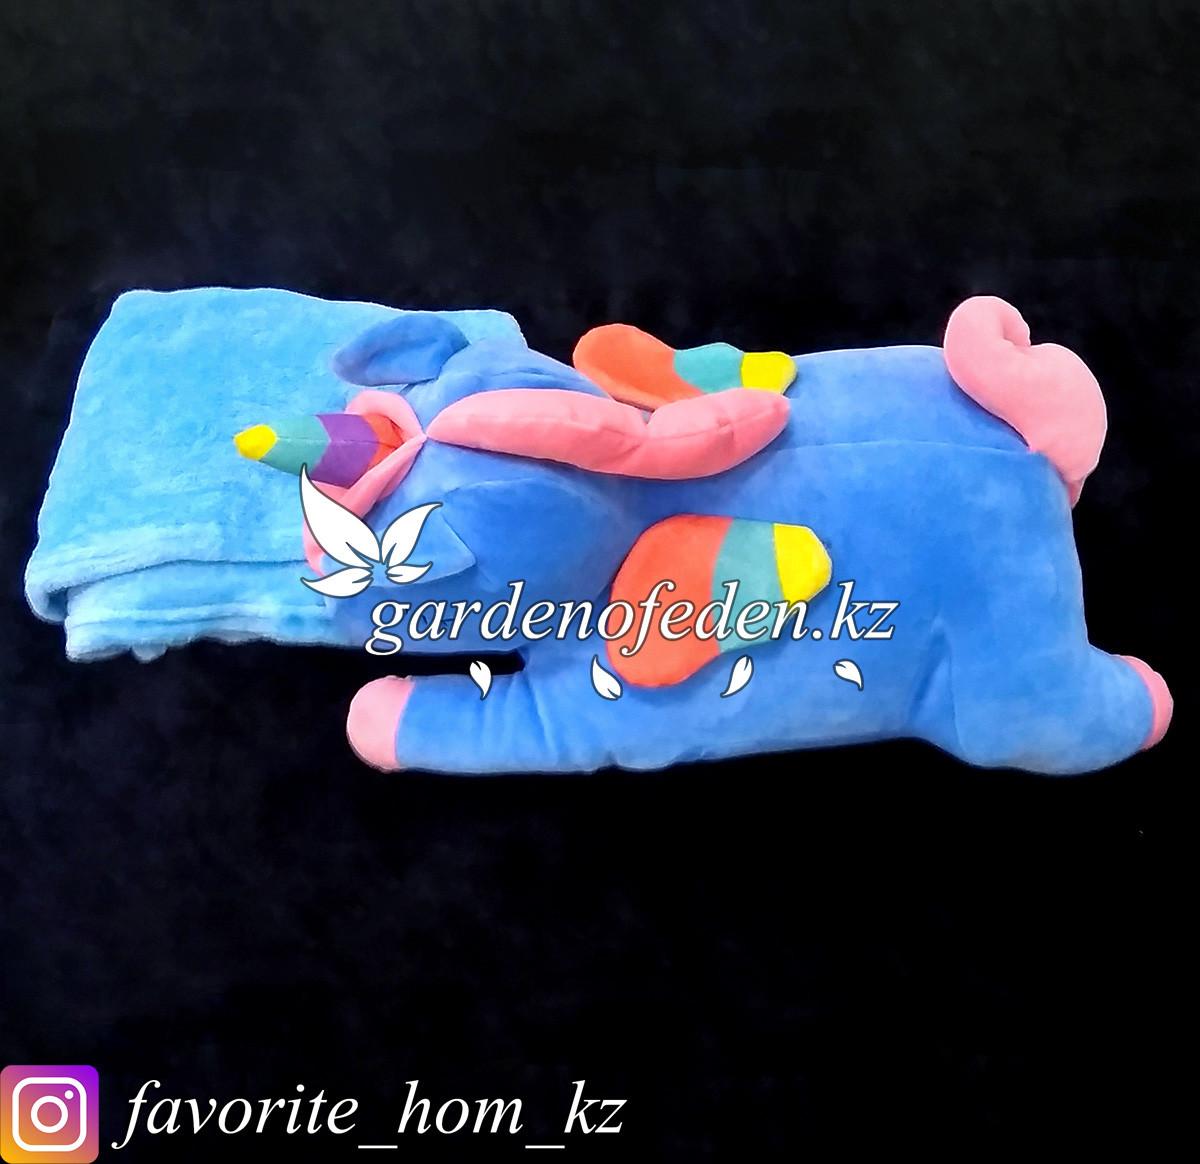 "Мягкая игрушка-подушка с пледом ""Единорог"". Цвет: Синий. Материал: Бархат/Плюш."